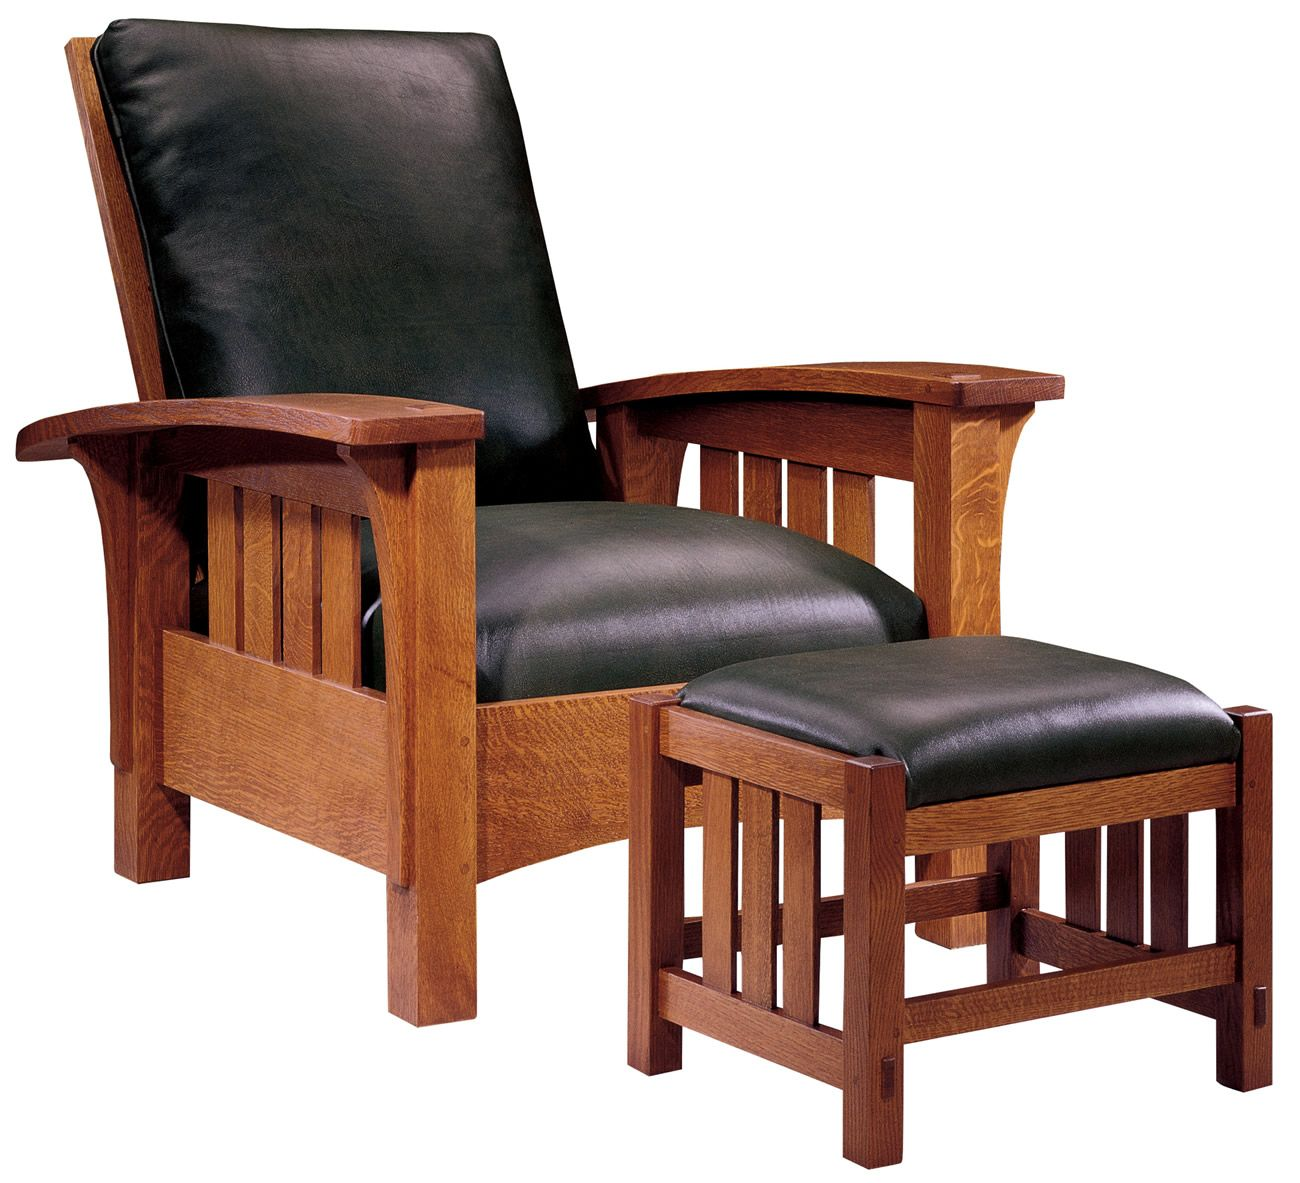 Stickley Furniture Classic Bow Arm Morris Chair  Ottoman